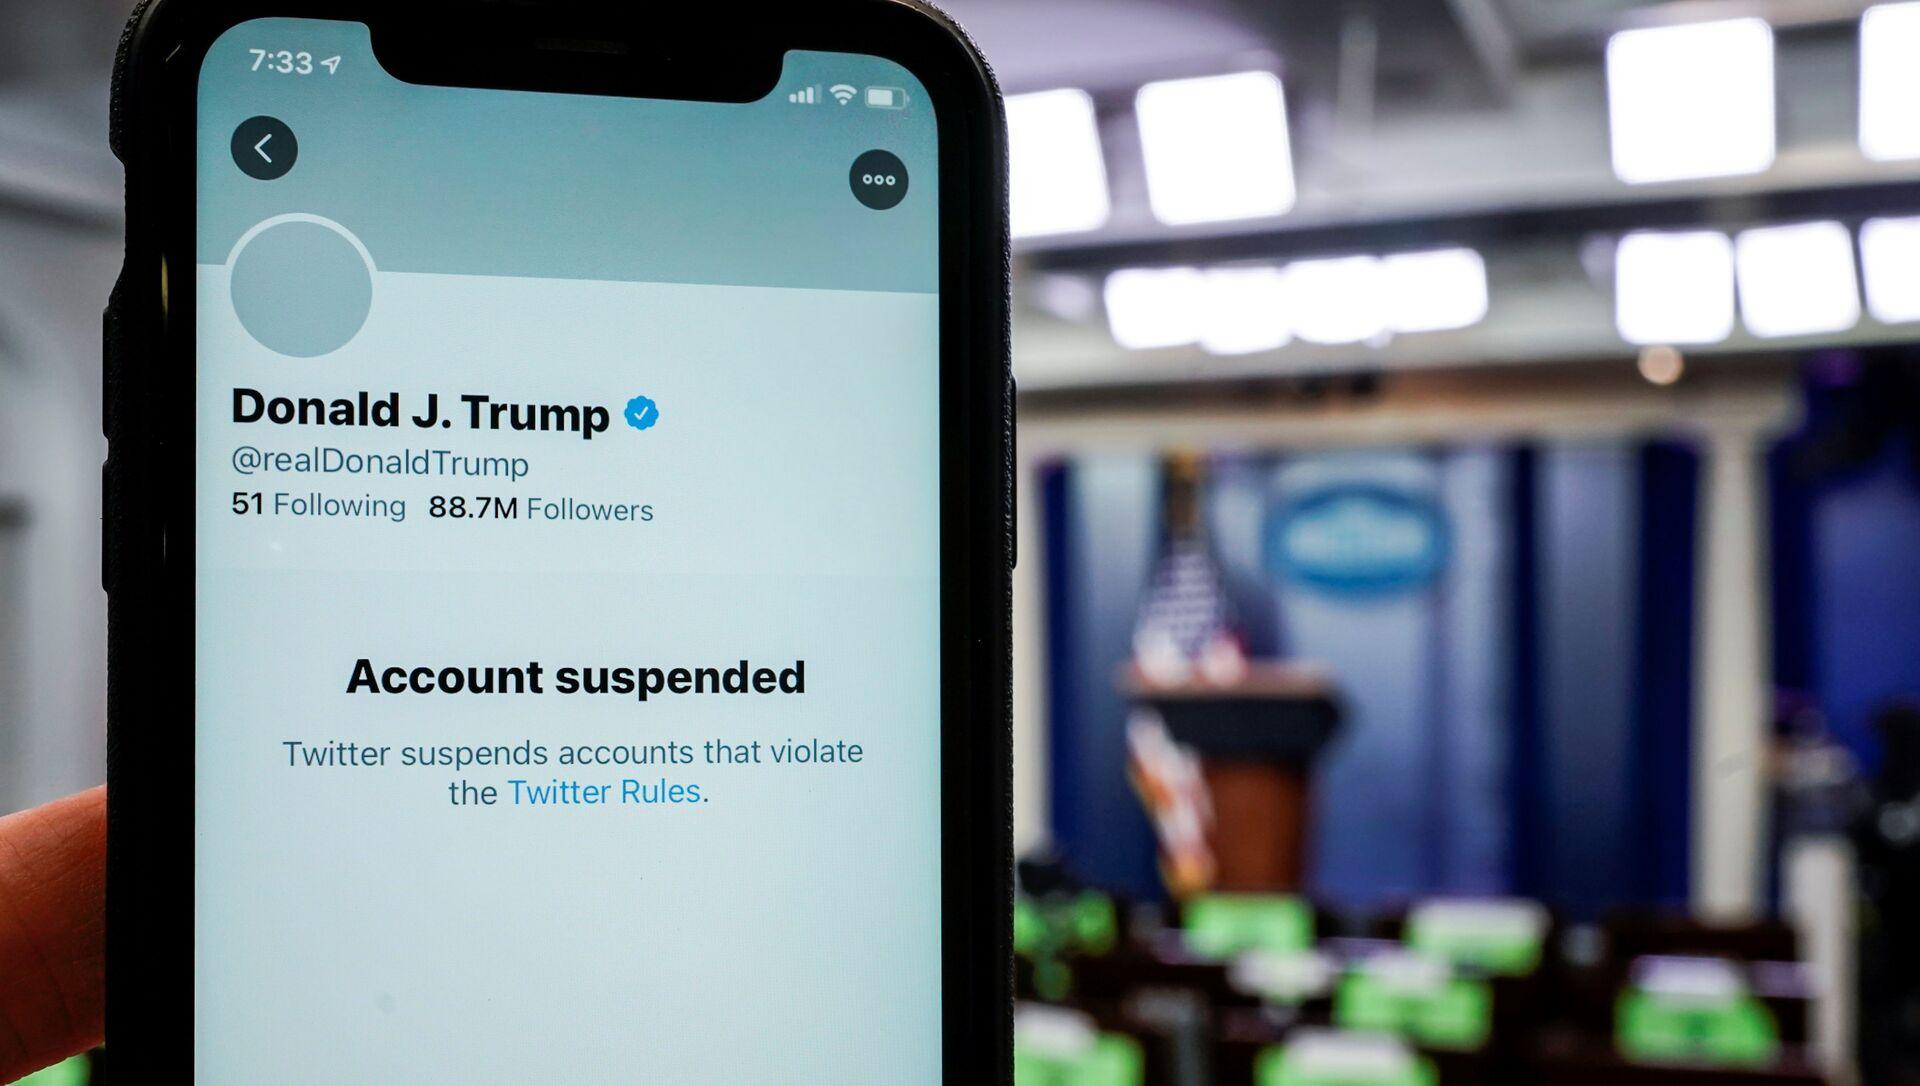 La cuenta de Donald Trump en Twitter - Sputnik Mundo, 1920, 22.01.2021